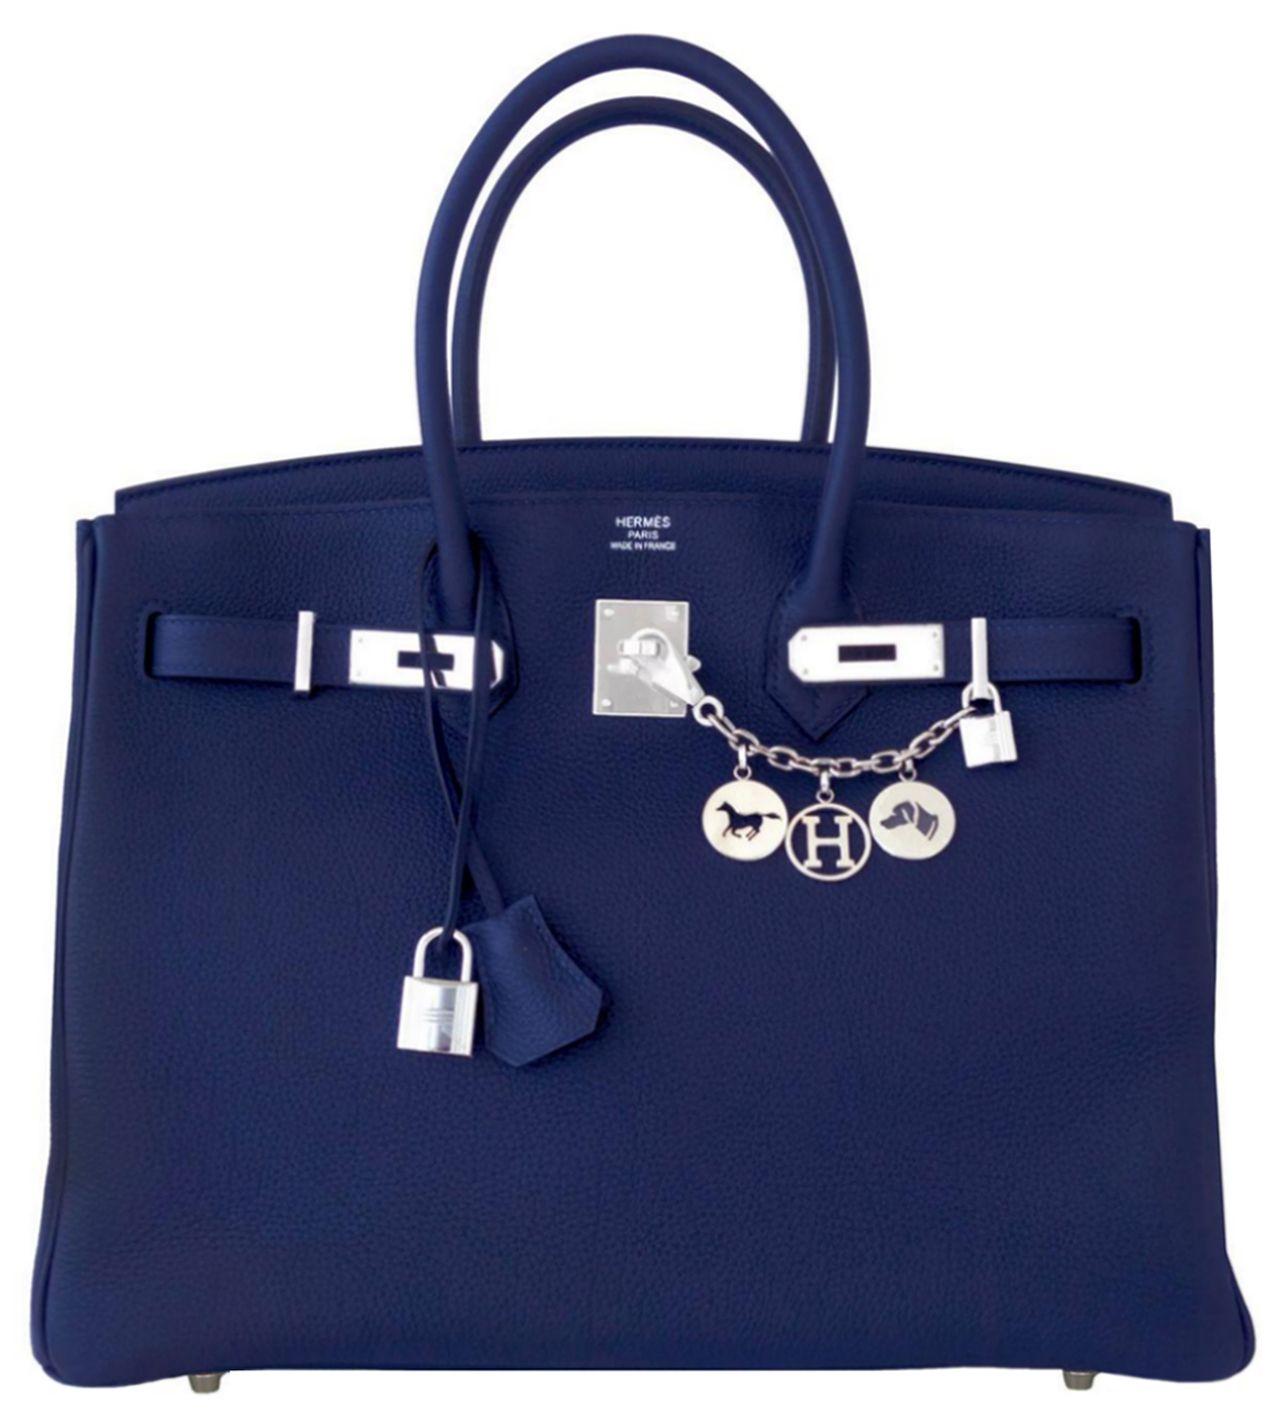 fd37345879a9 Hermes Birkin  Bag Navy Blue Nuit Togo Palladium Hardware